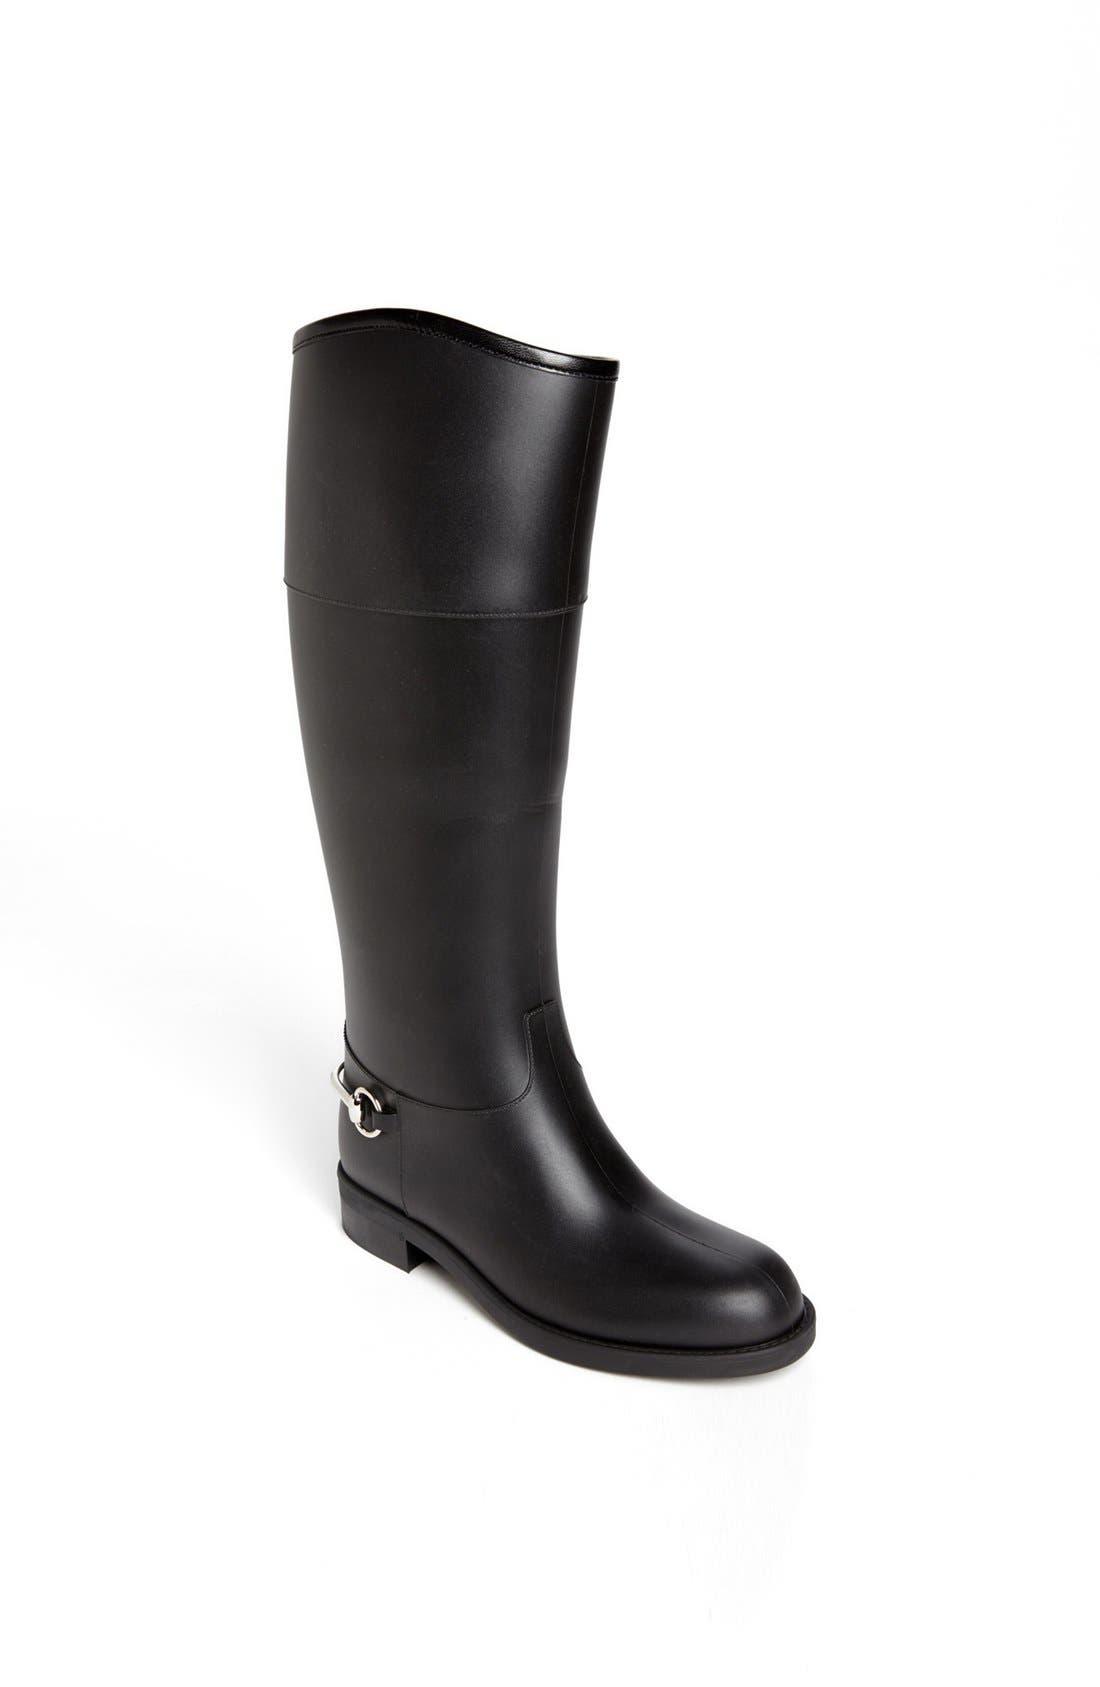 Main Image - Gucci Rubber Waterproof Rain Boot